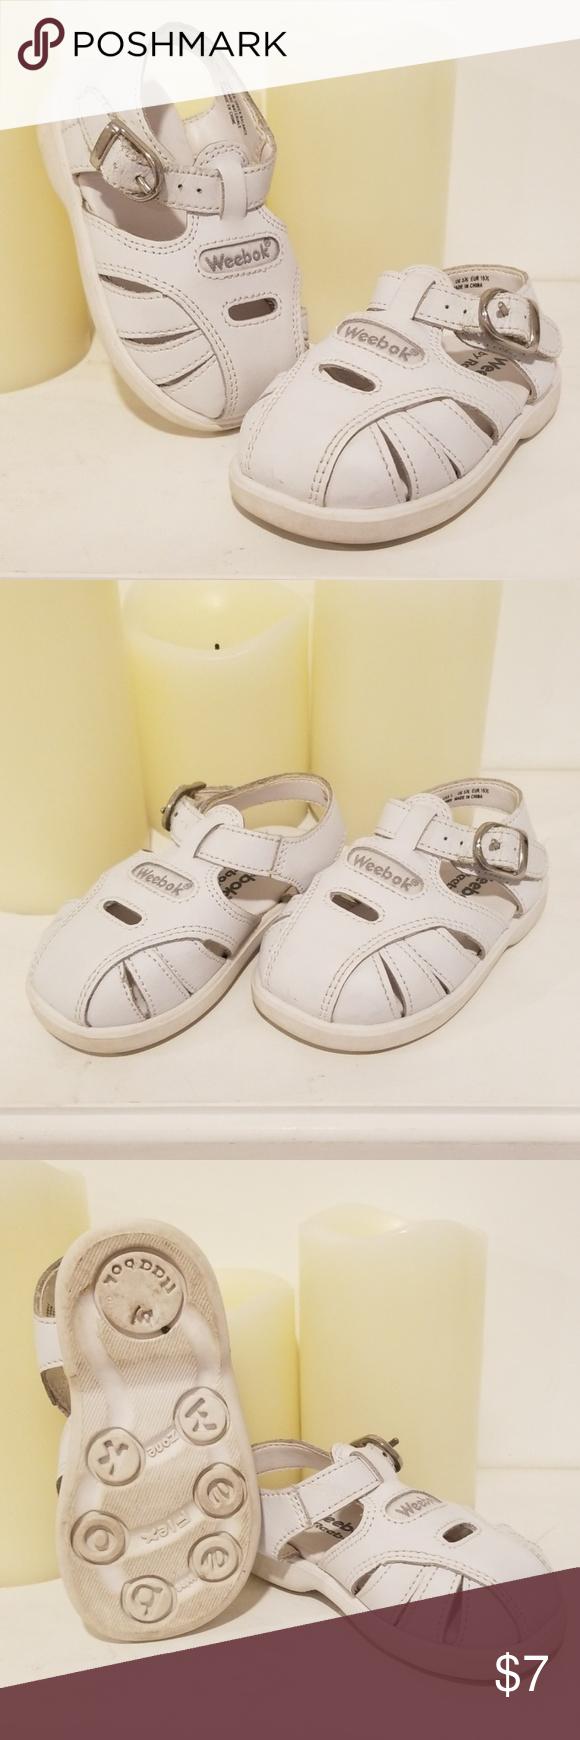 Reebok White Baby Girl Sandals Size